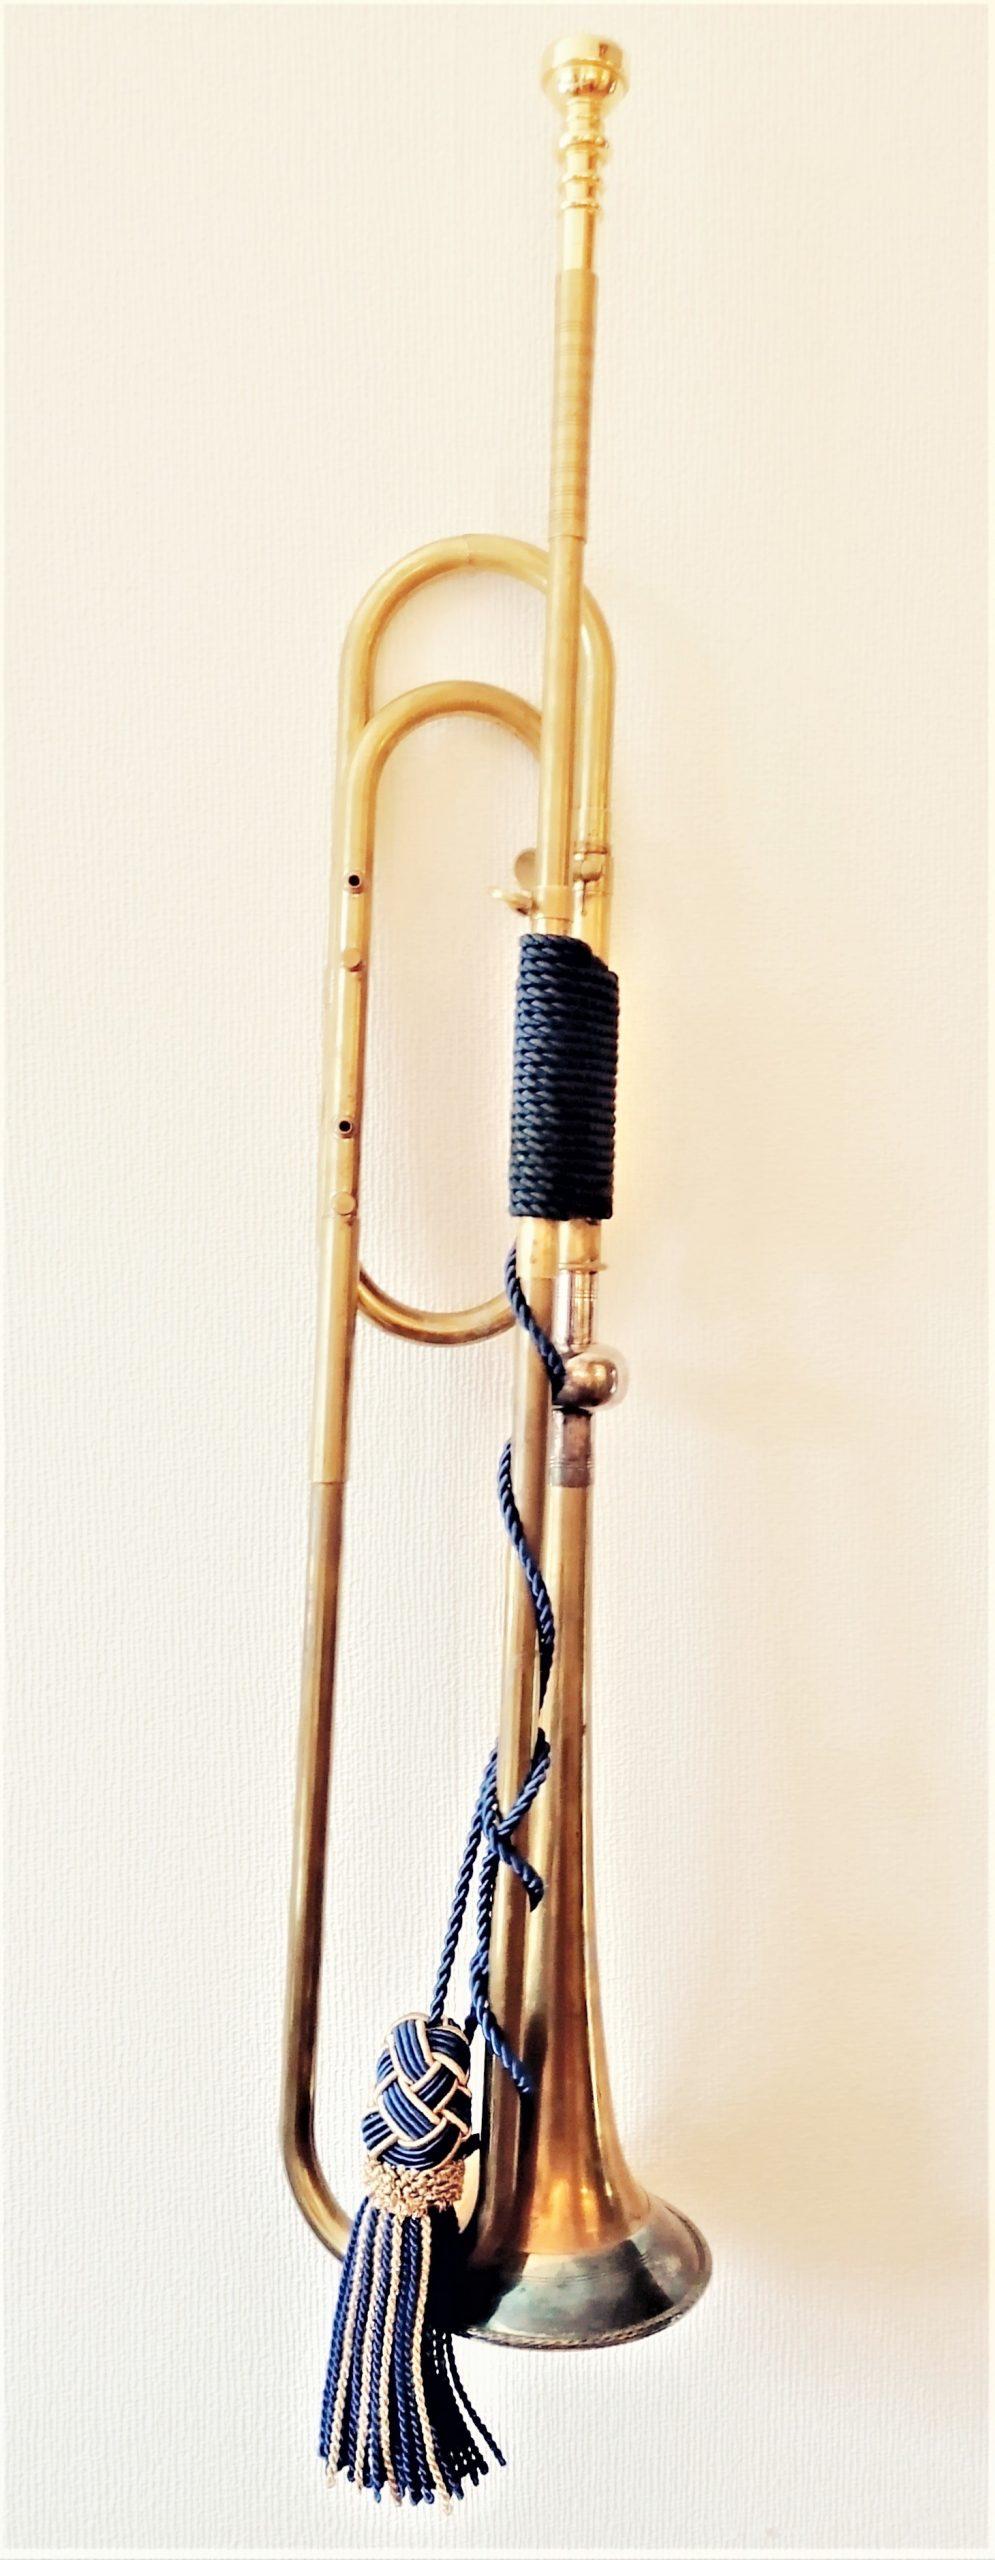 Barocktrompete